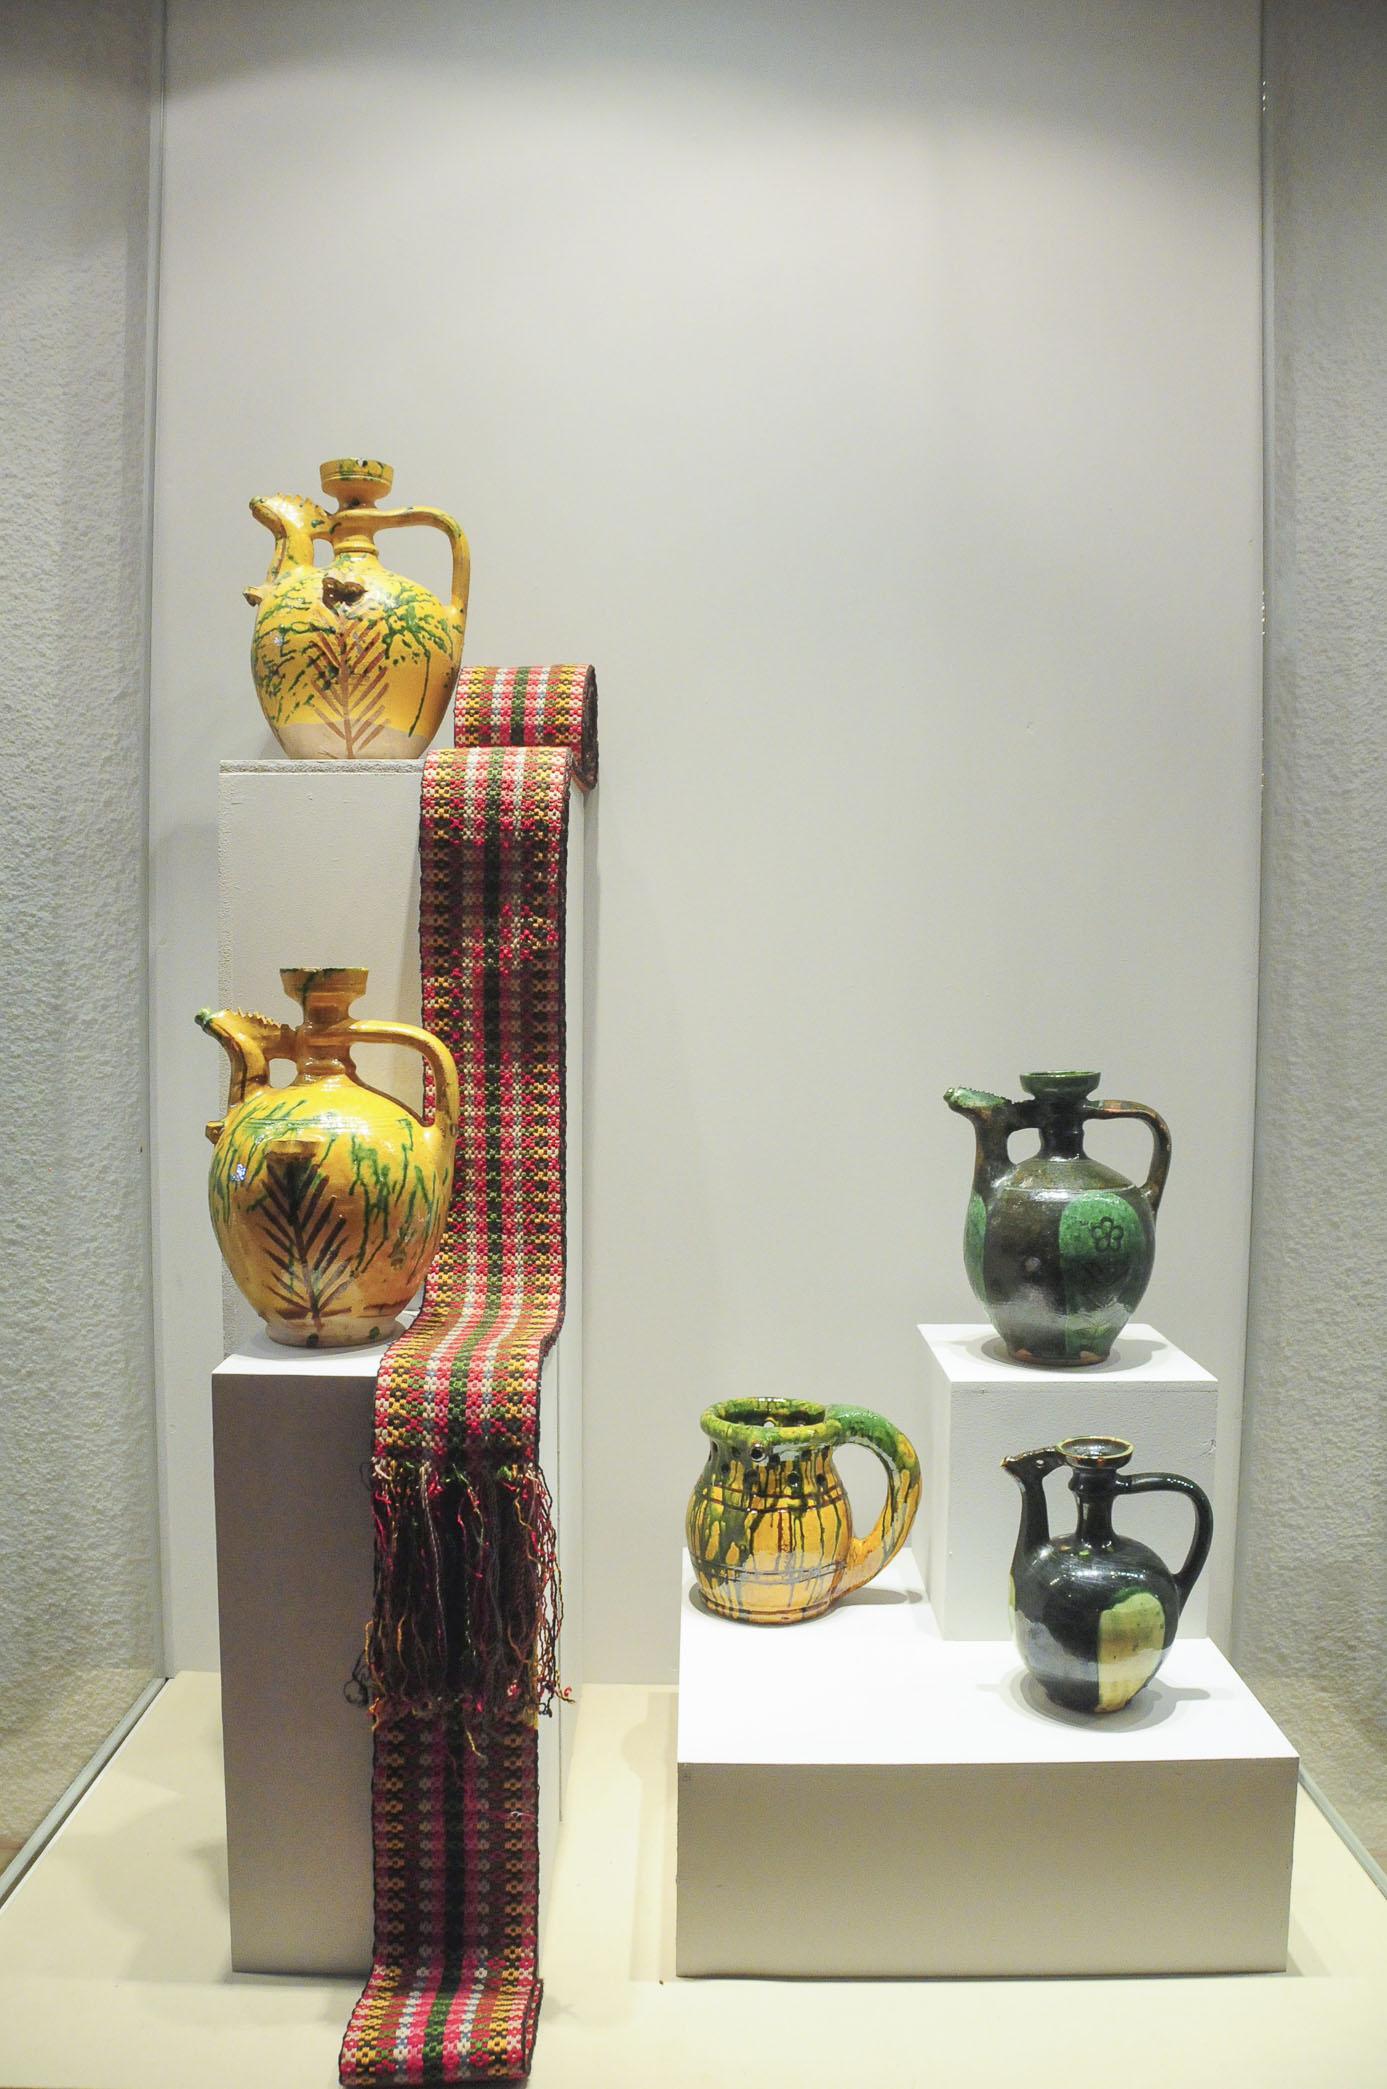 troyan-museum-magiata-na-severozapada-3